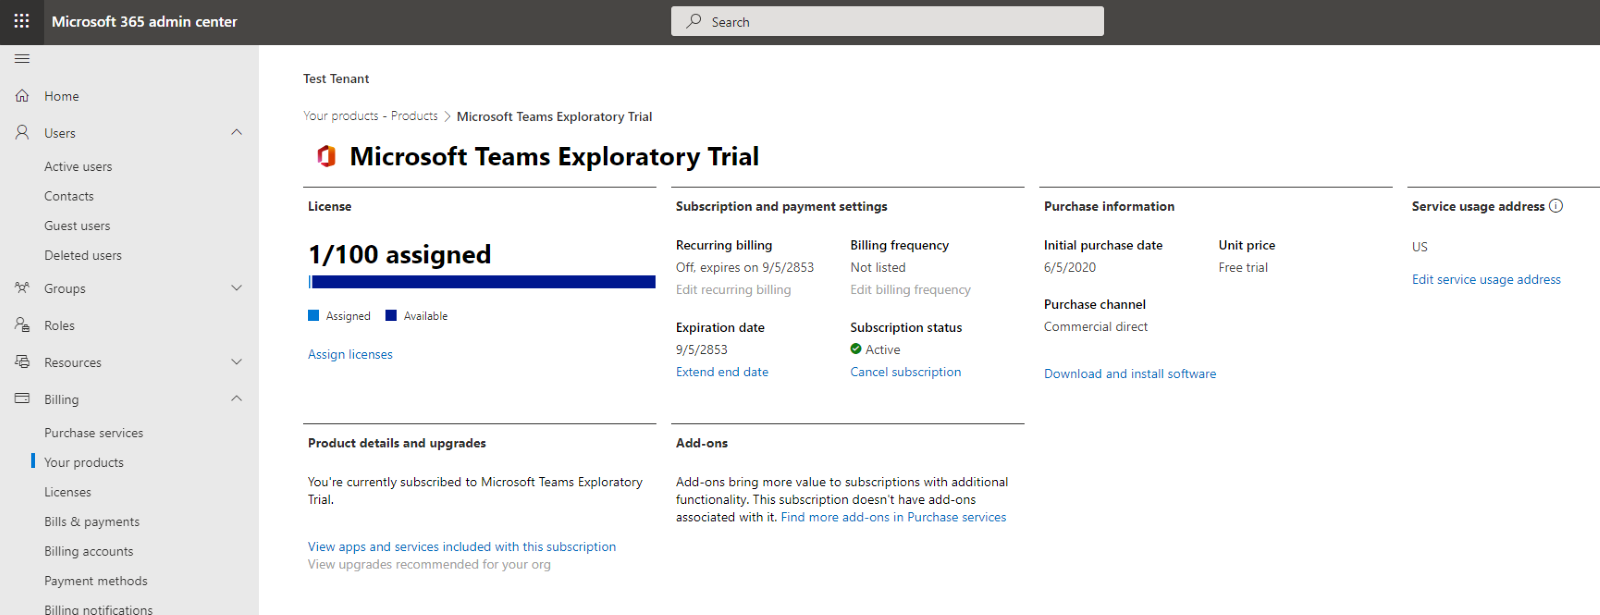 microsoft teams exploratory experience